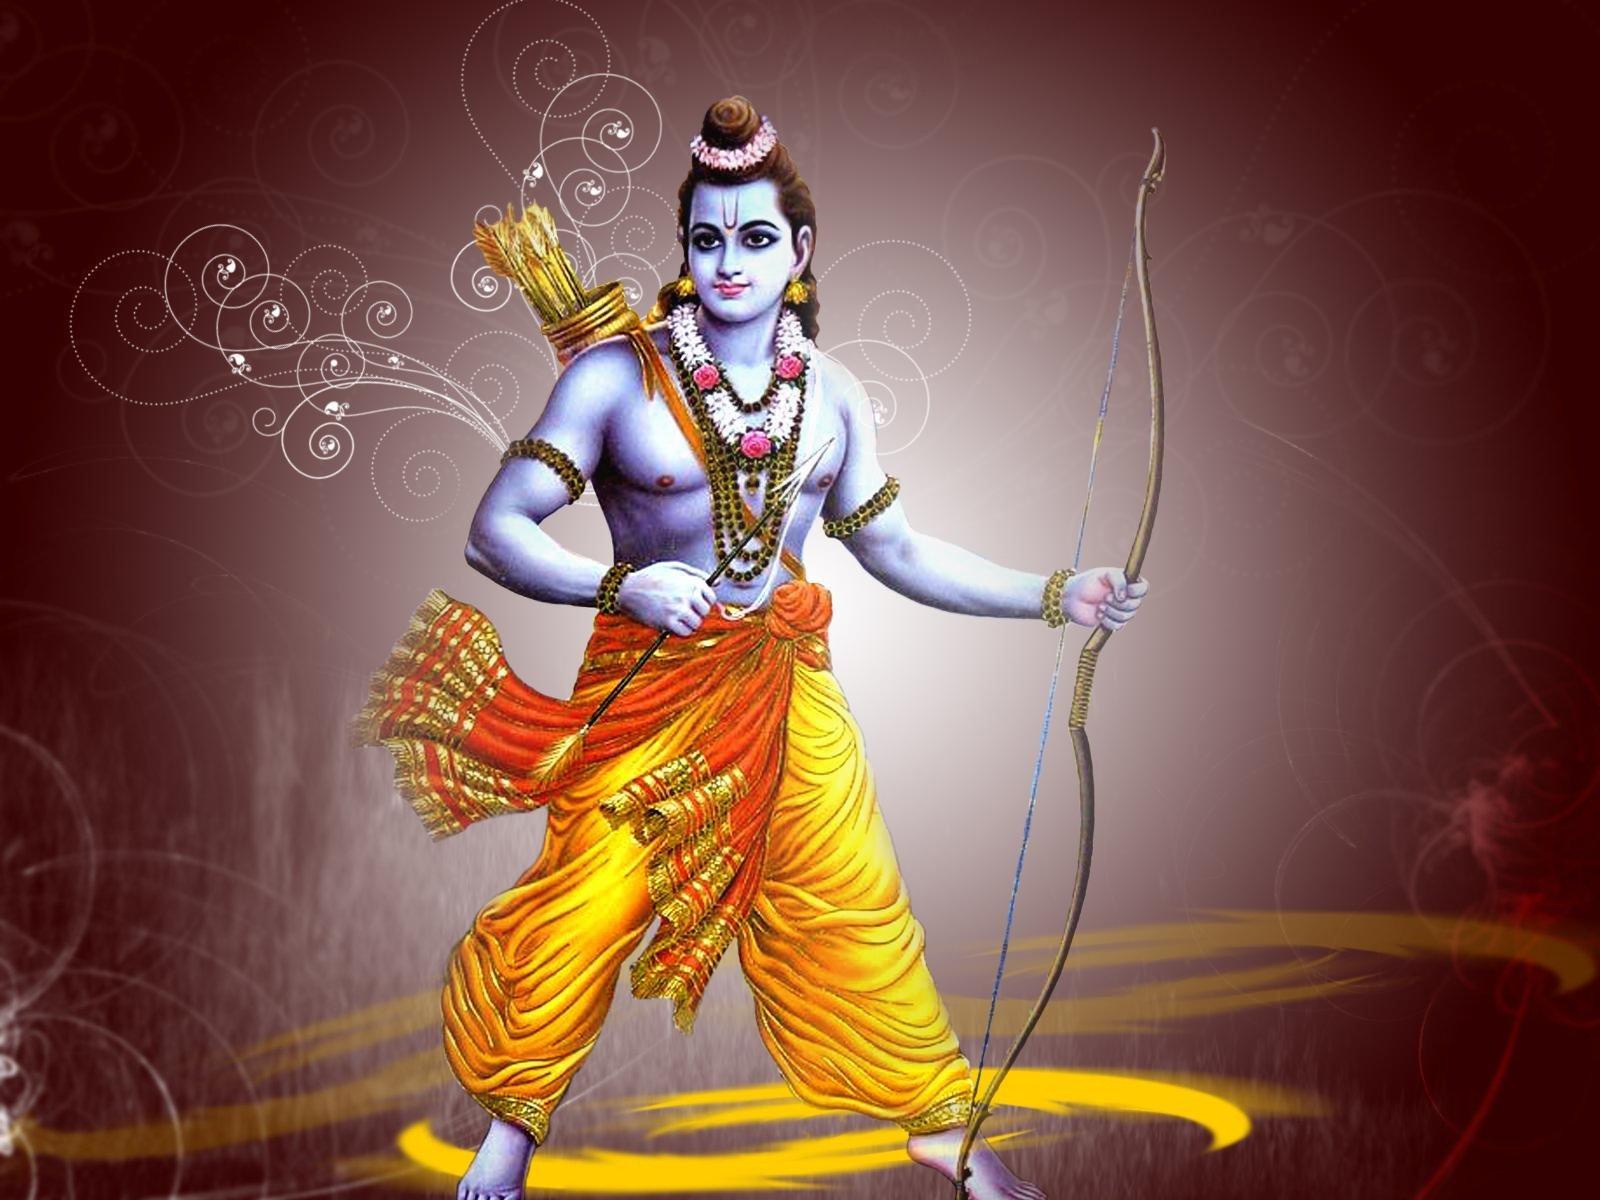 शोभा रानी: Shri Ram Varnan Shlok (From Ramayana)